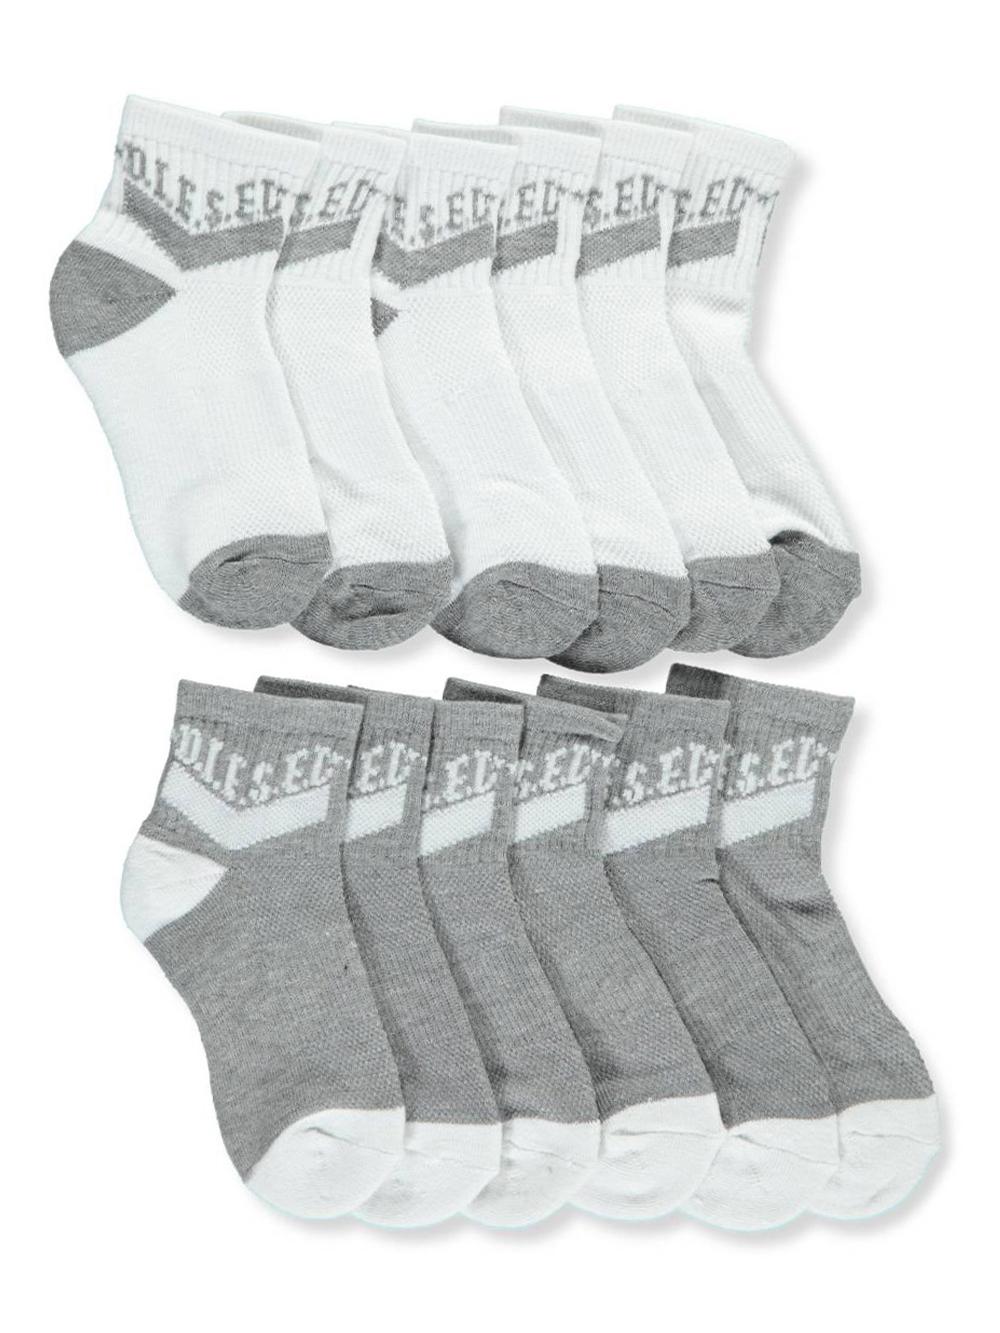 041ff747fbdc Boys' 6-Pack Crew Socks by Diesel in White/gray